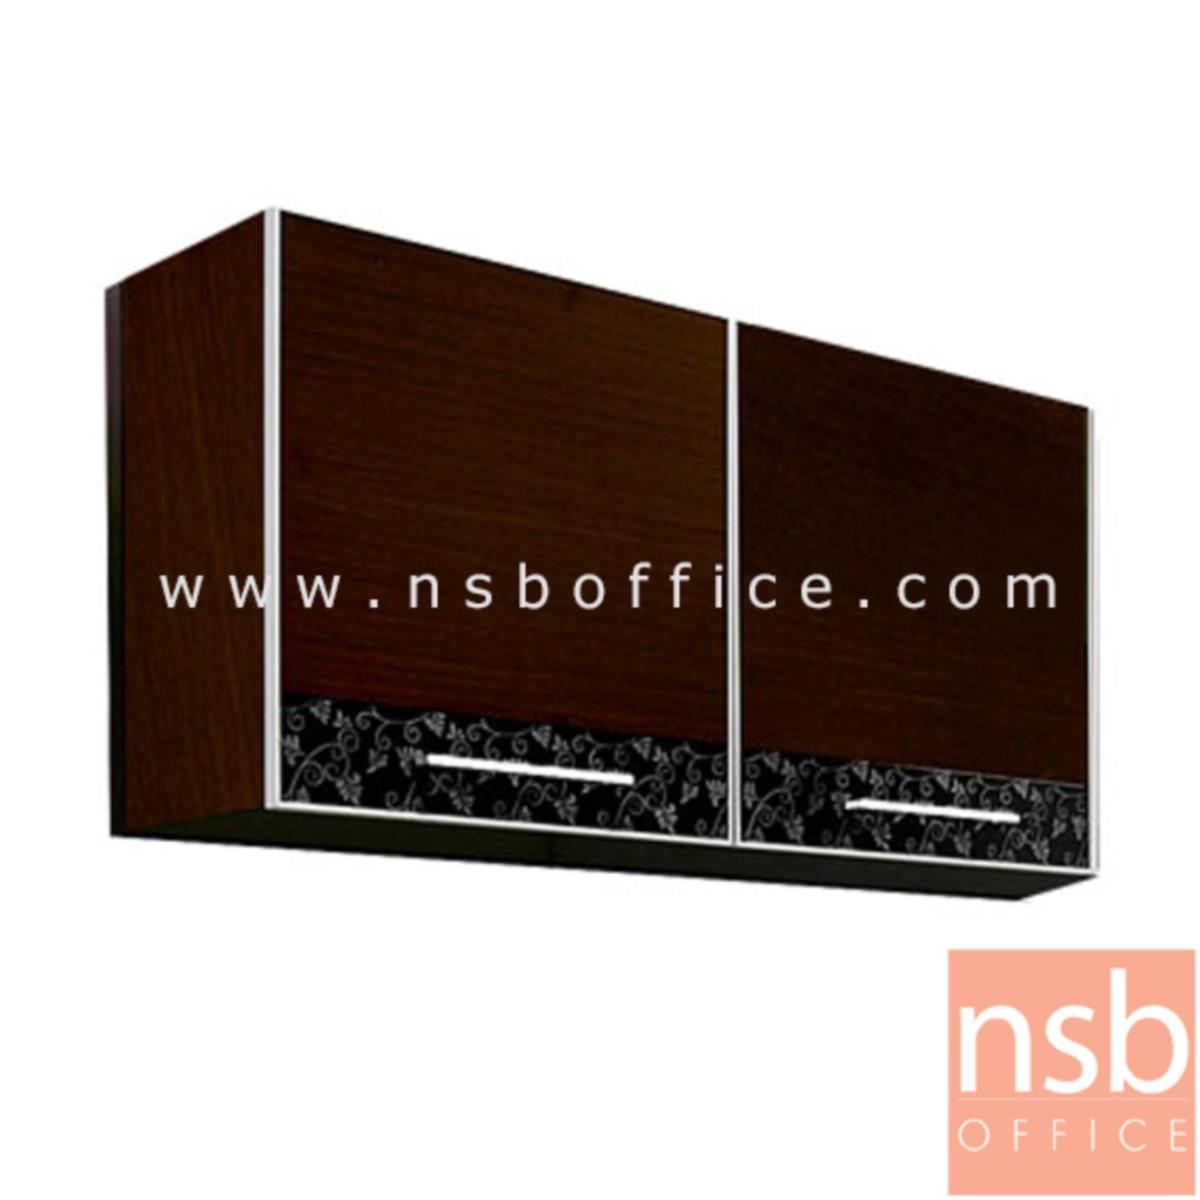 K03A032:ตู้ครัวแขวงผนัง กว้าง 120 ซม.  รุ่น Boden (โบเดน)